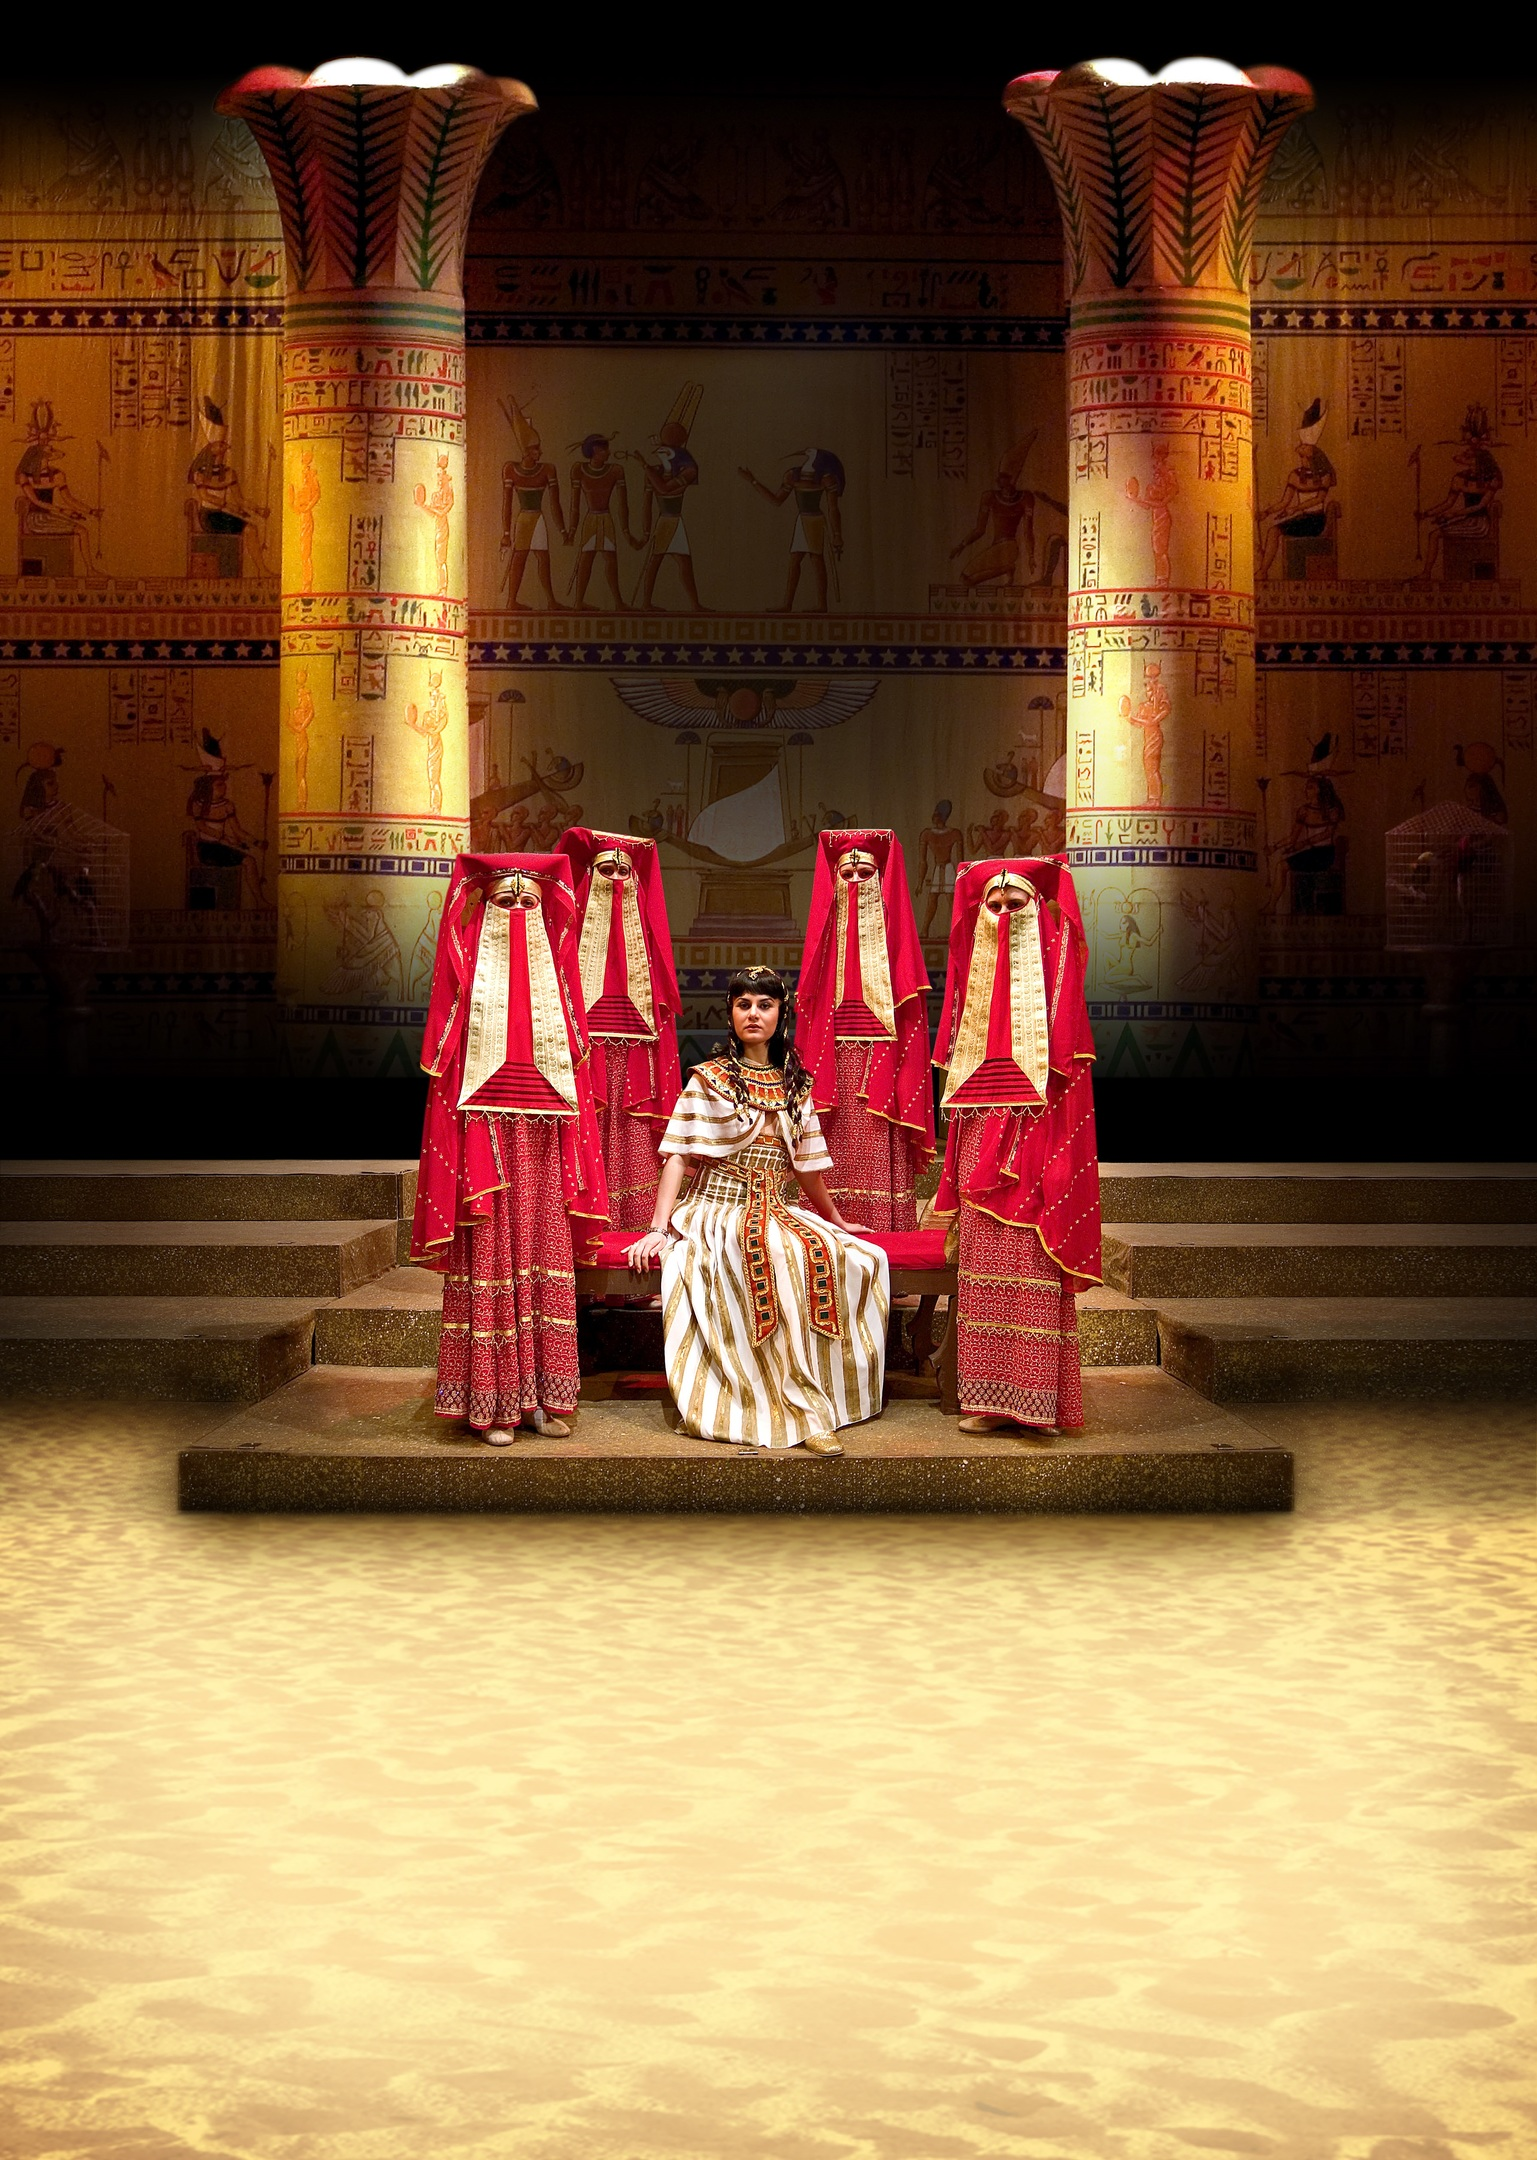 VERDI AIDA Verdi Aida, a new interpretation of the classic opera 'Aida'